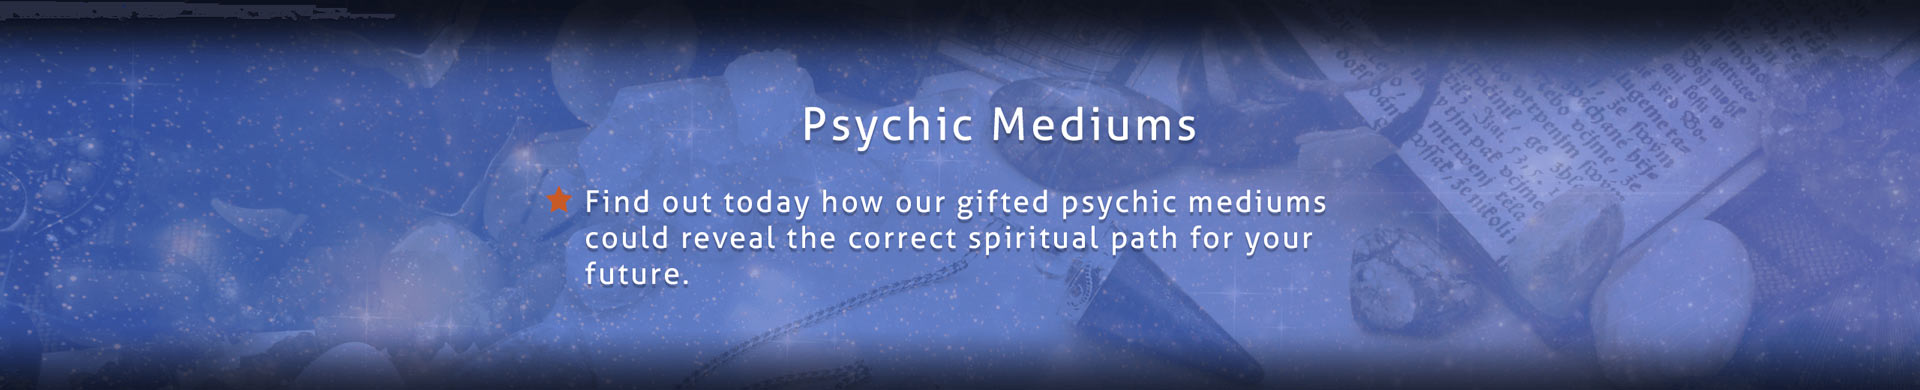 Psychic Mediums Night Star